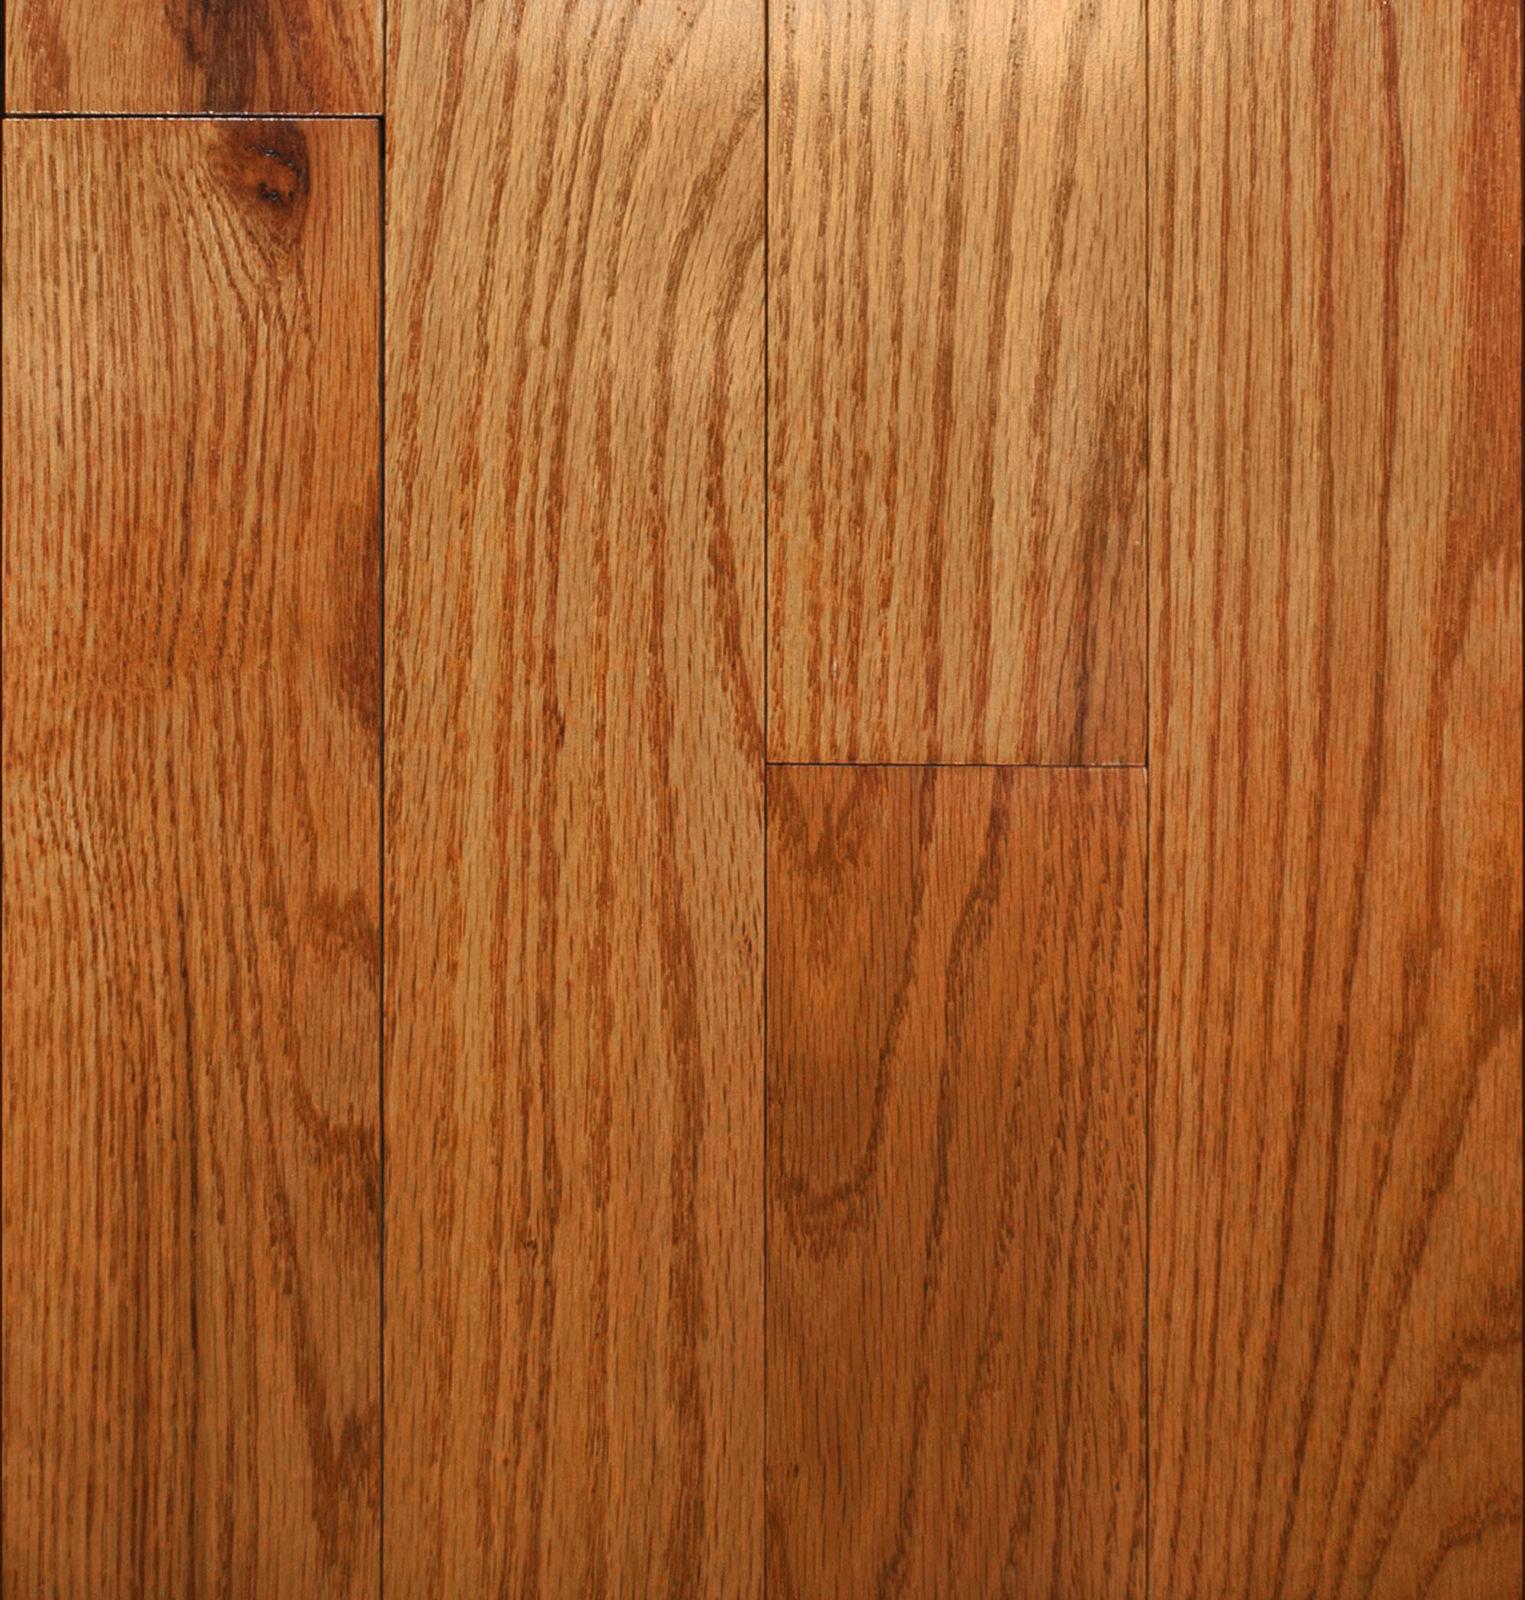 Mohawk Red Oak Butterscotch